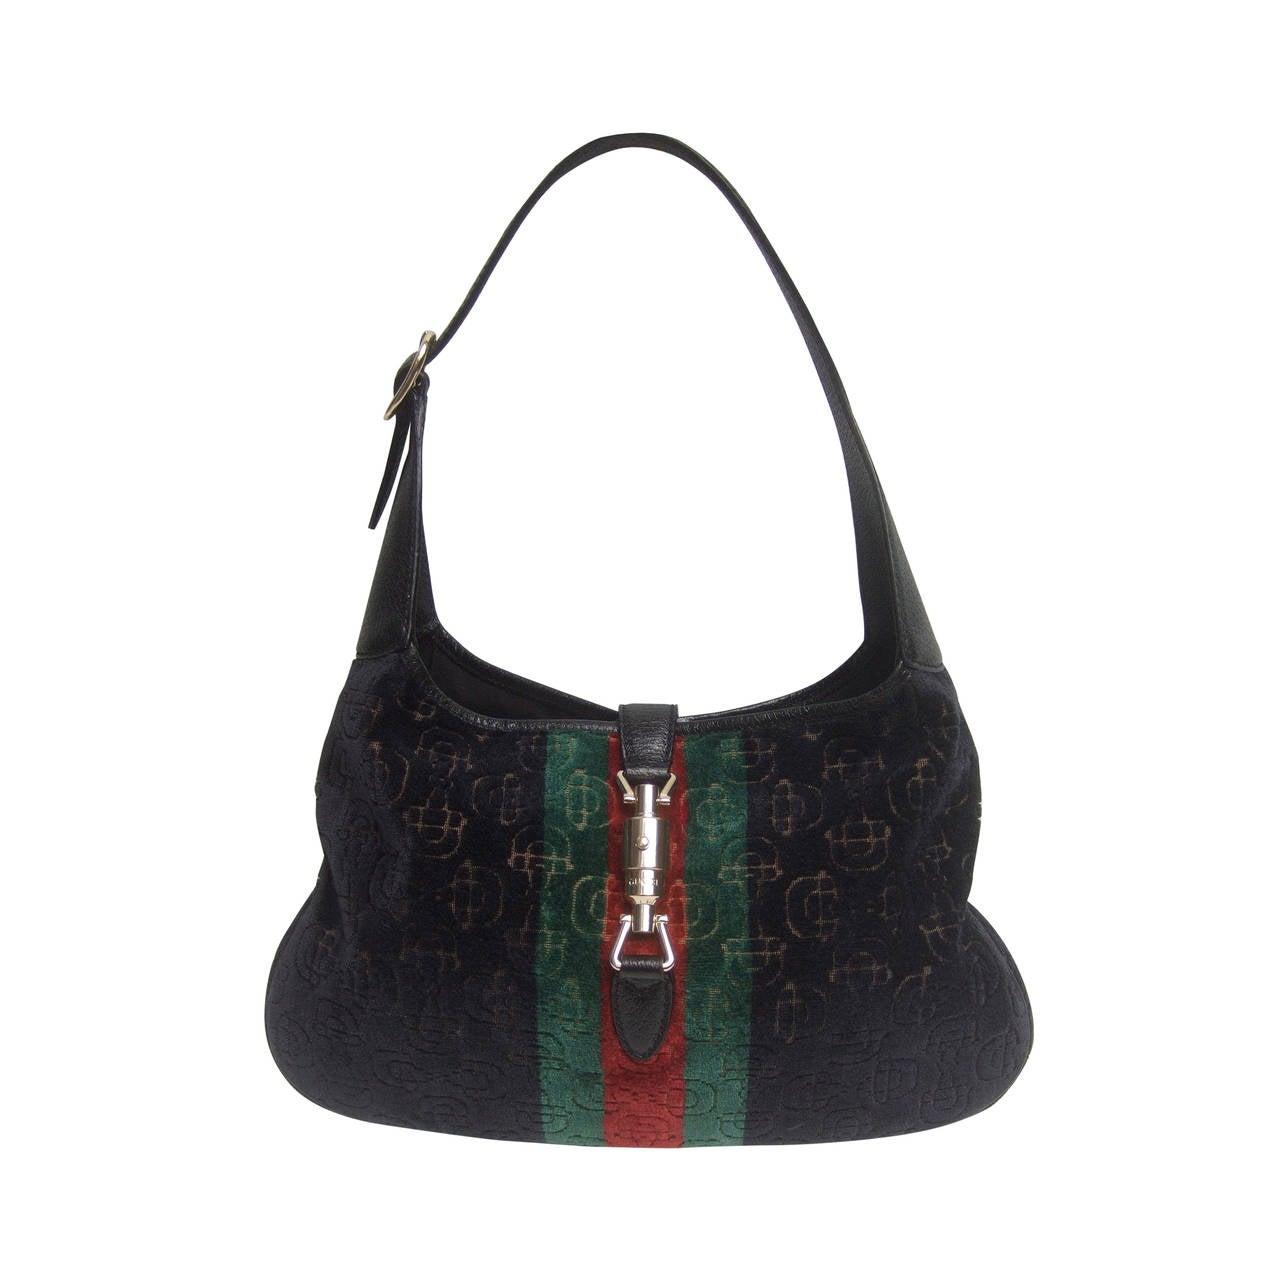 8e6adc7fdbe Gucci Italy Iconic Devore Jackie O Piston Handbag at 1stdibs